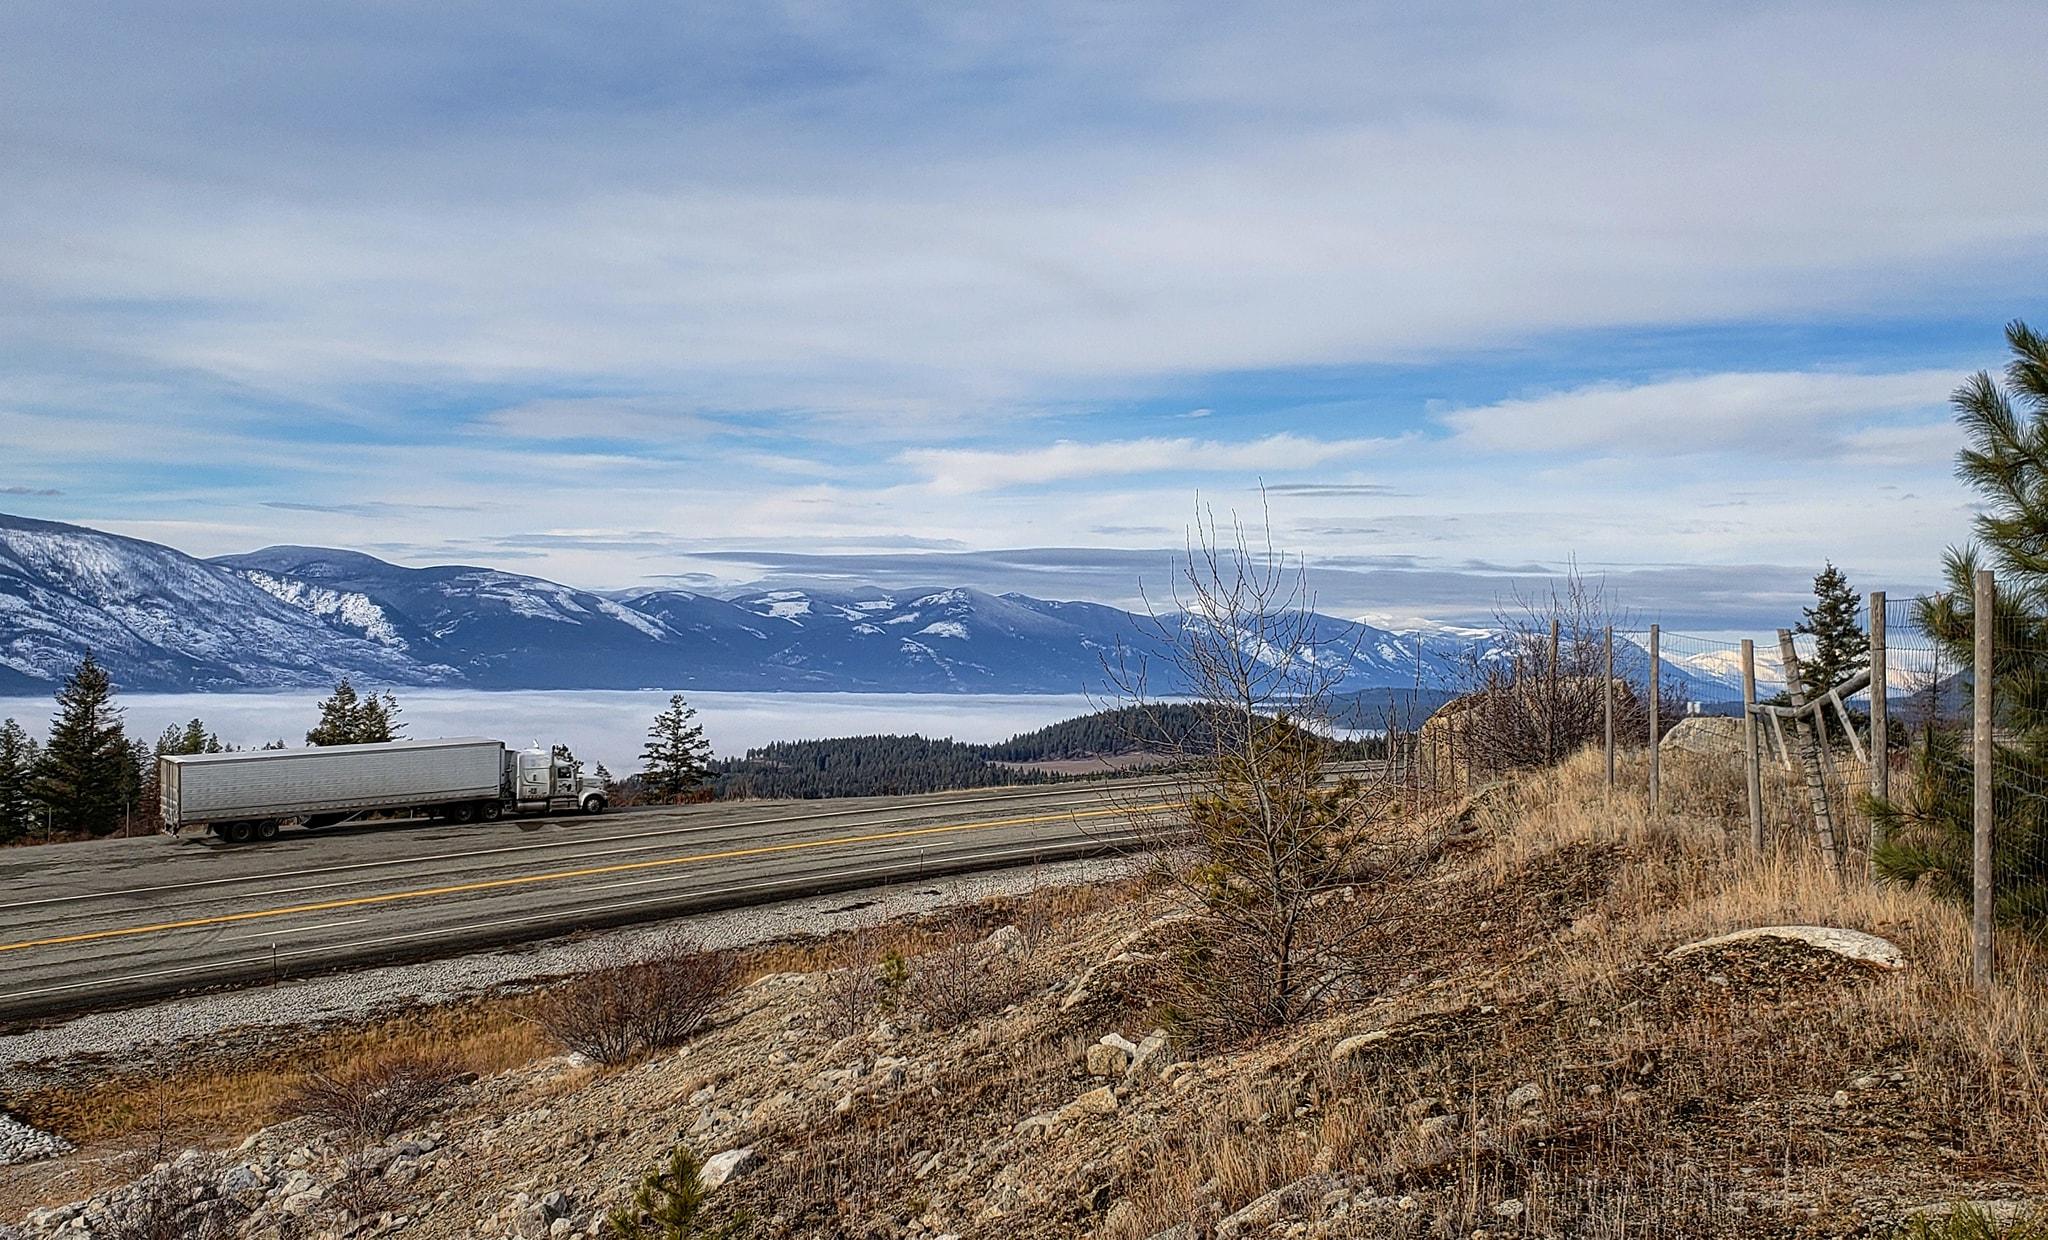 6-1-2019-rondreis-van-2800-km-Montana-Idaho-Oregon-Washington-(16)